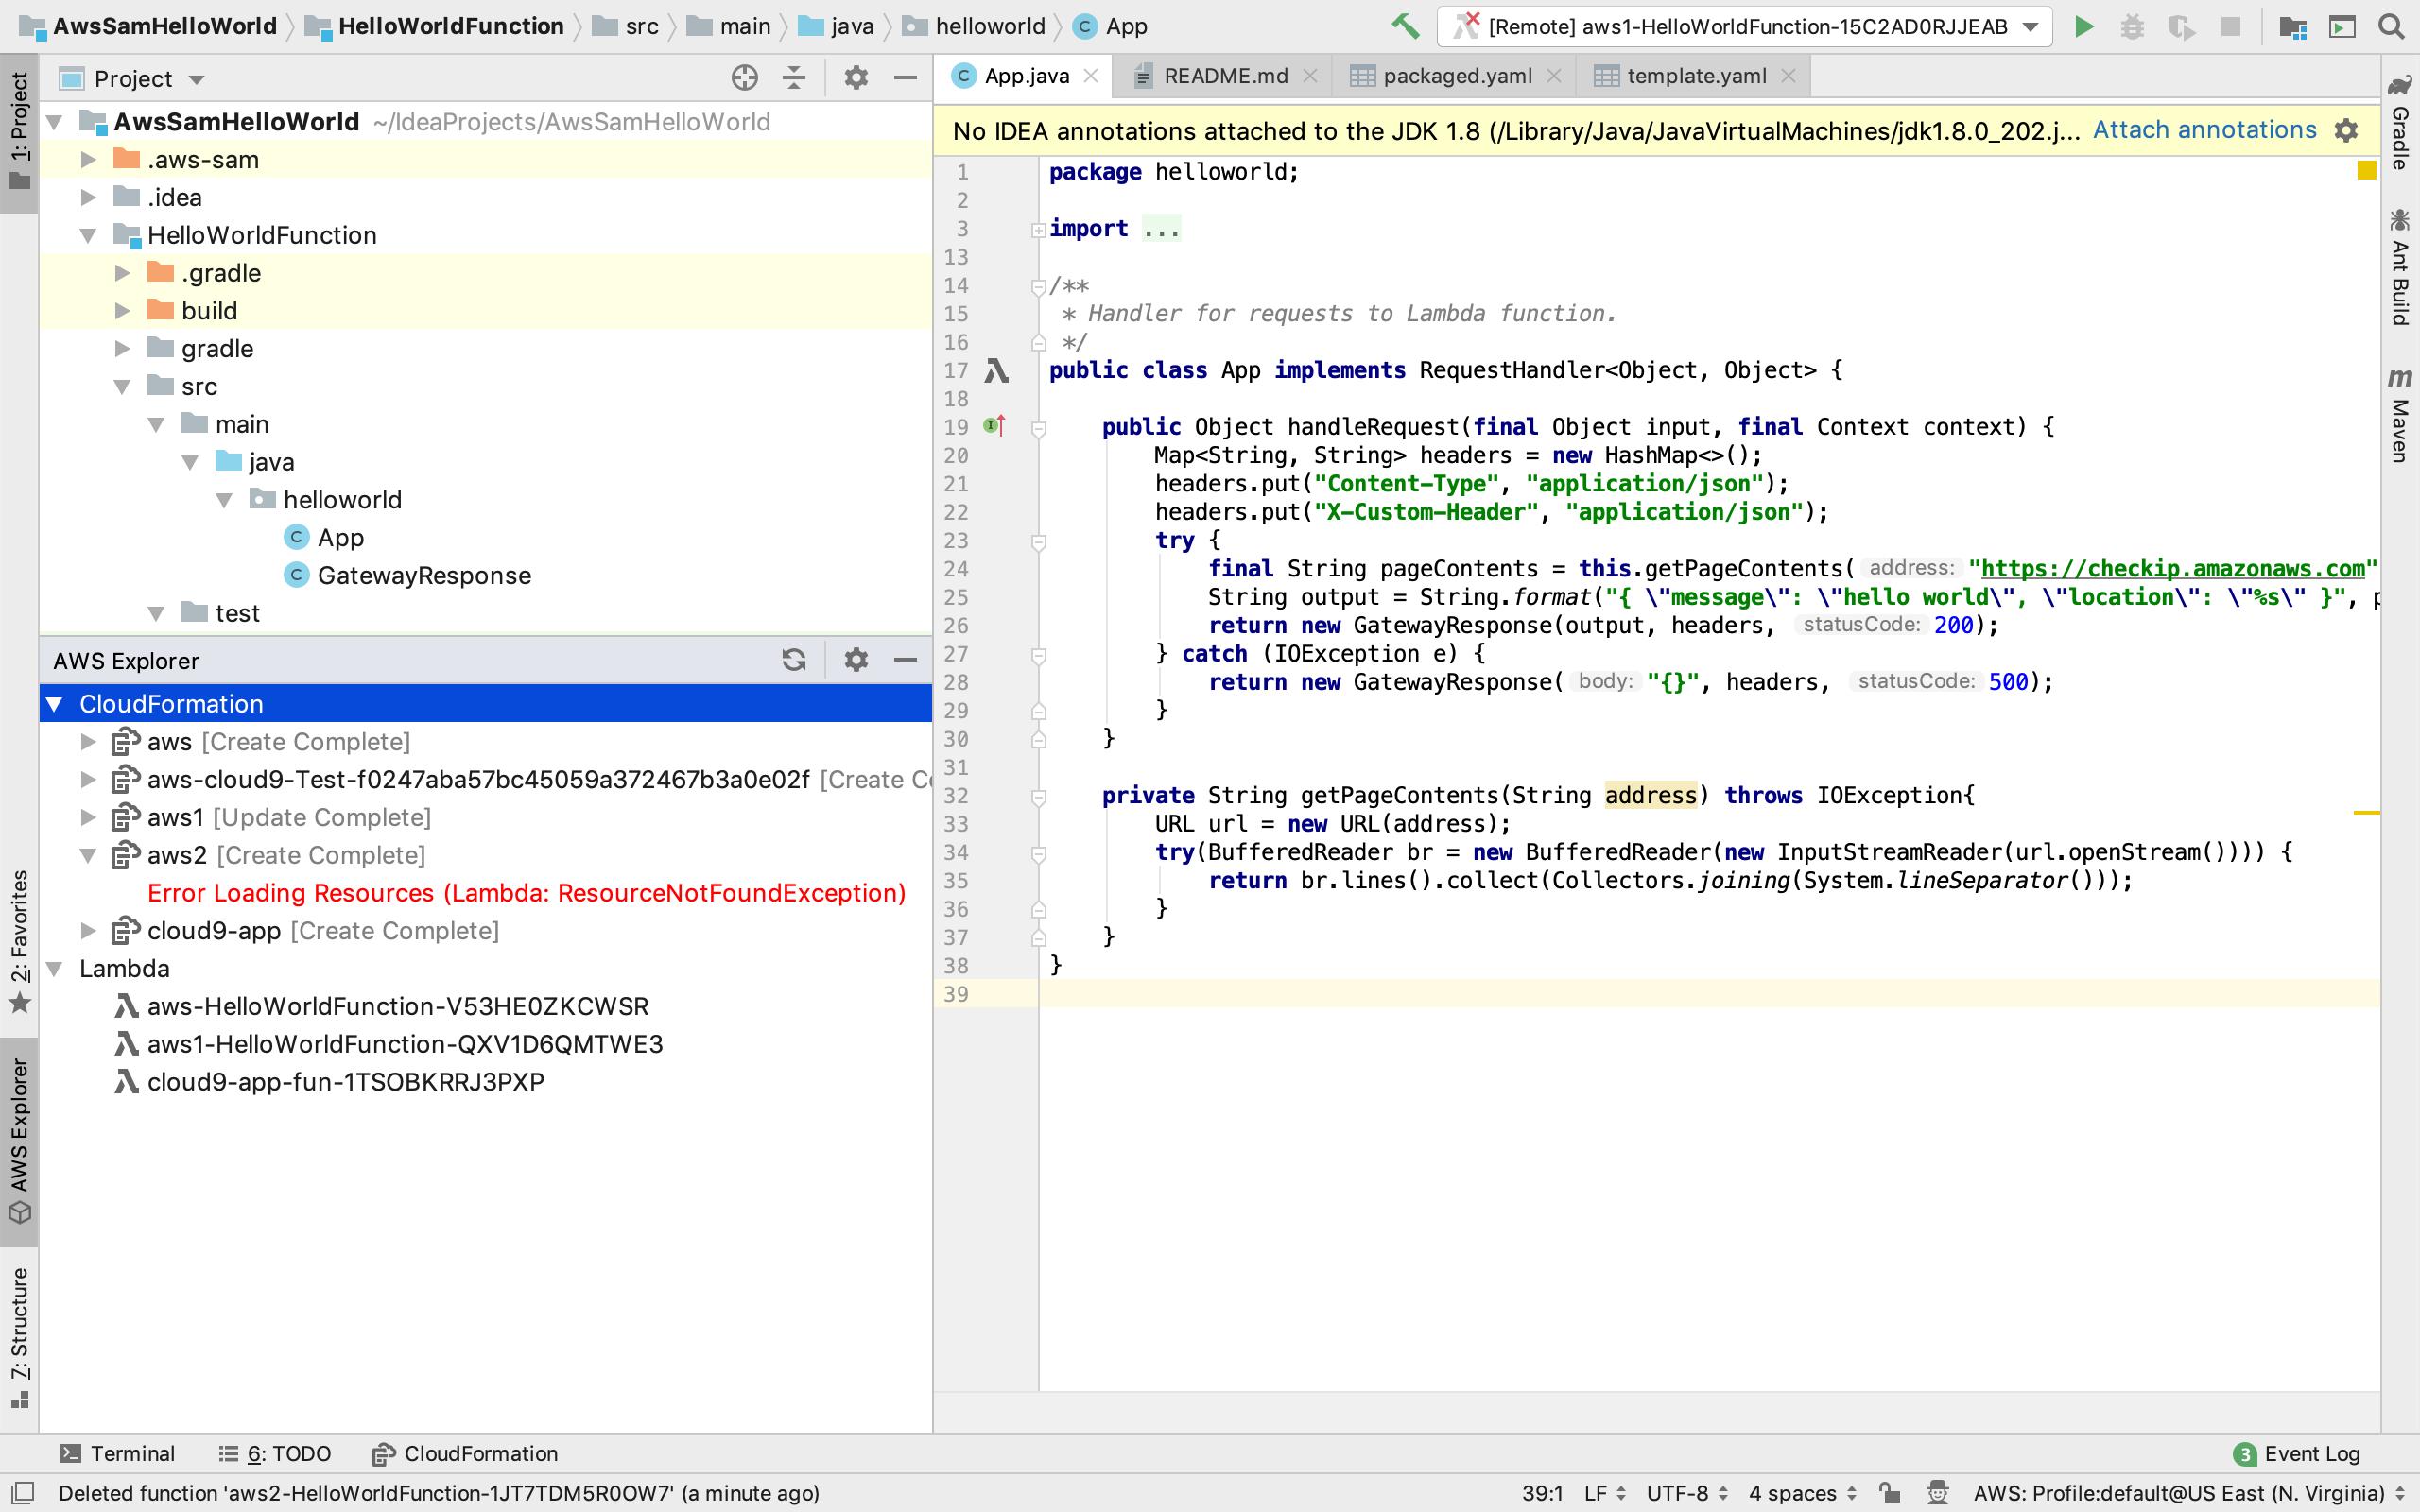 Error displayed in AWS explorer when deleting lambda/stack